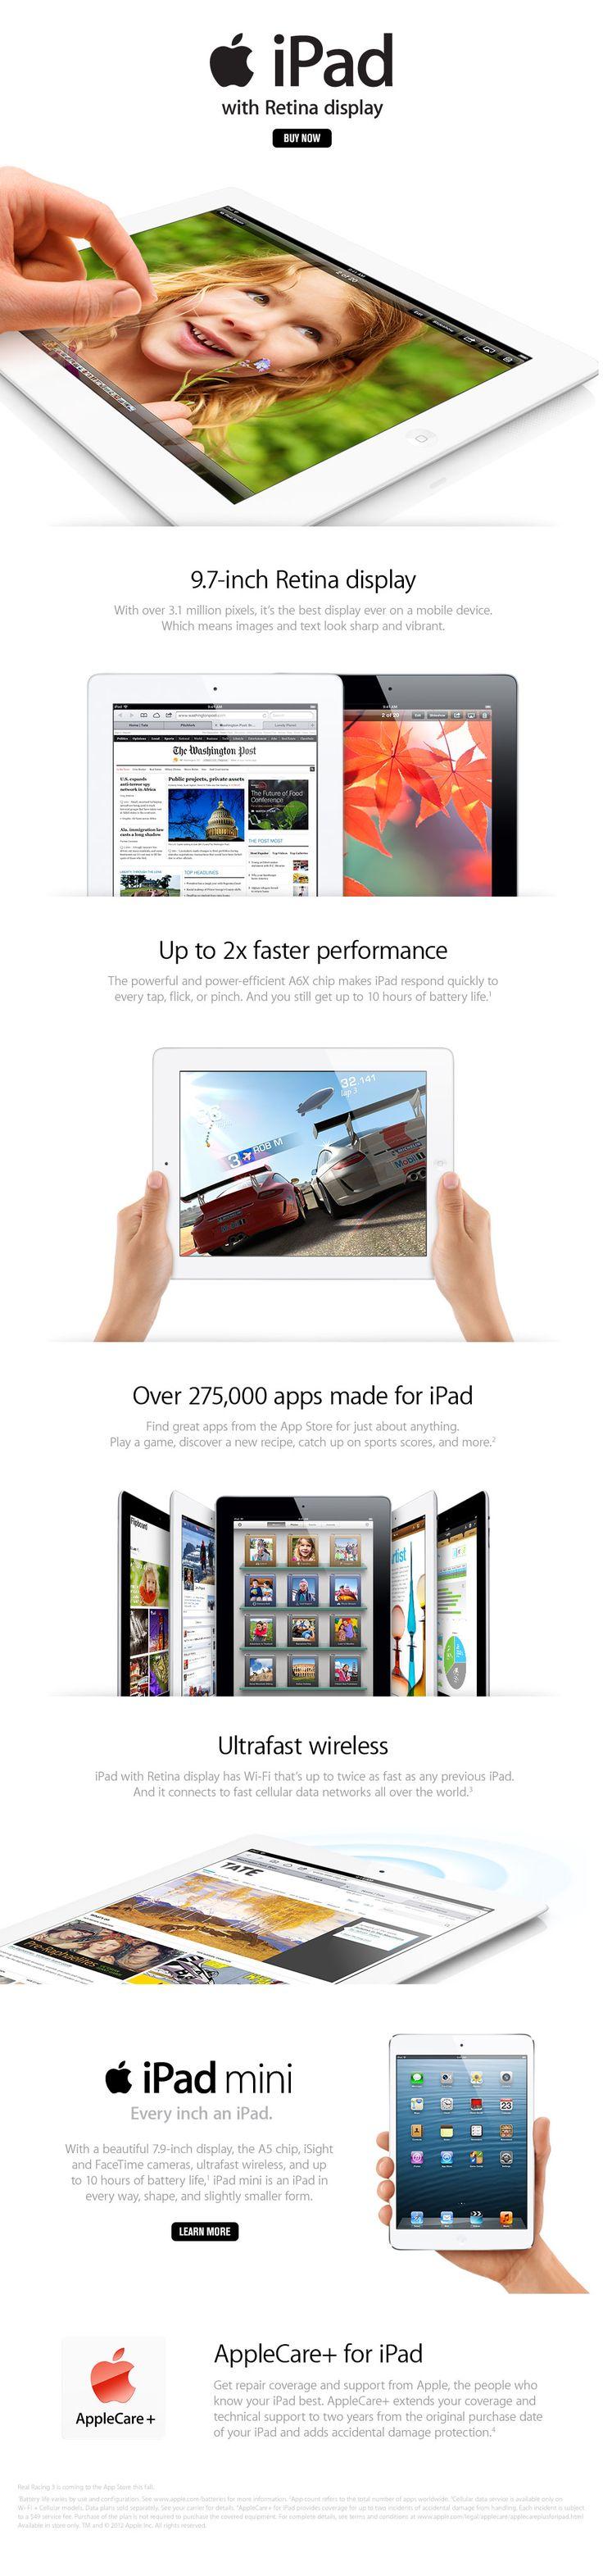 iPad.......miss mine since it crashed.  Looking forward to getting a new one.  =) @Christine Ballisty Kolek www.christinekolek.com #iPad #Apple #AppleProducts #Tablet #ChristineKolek